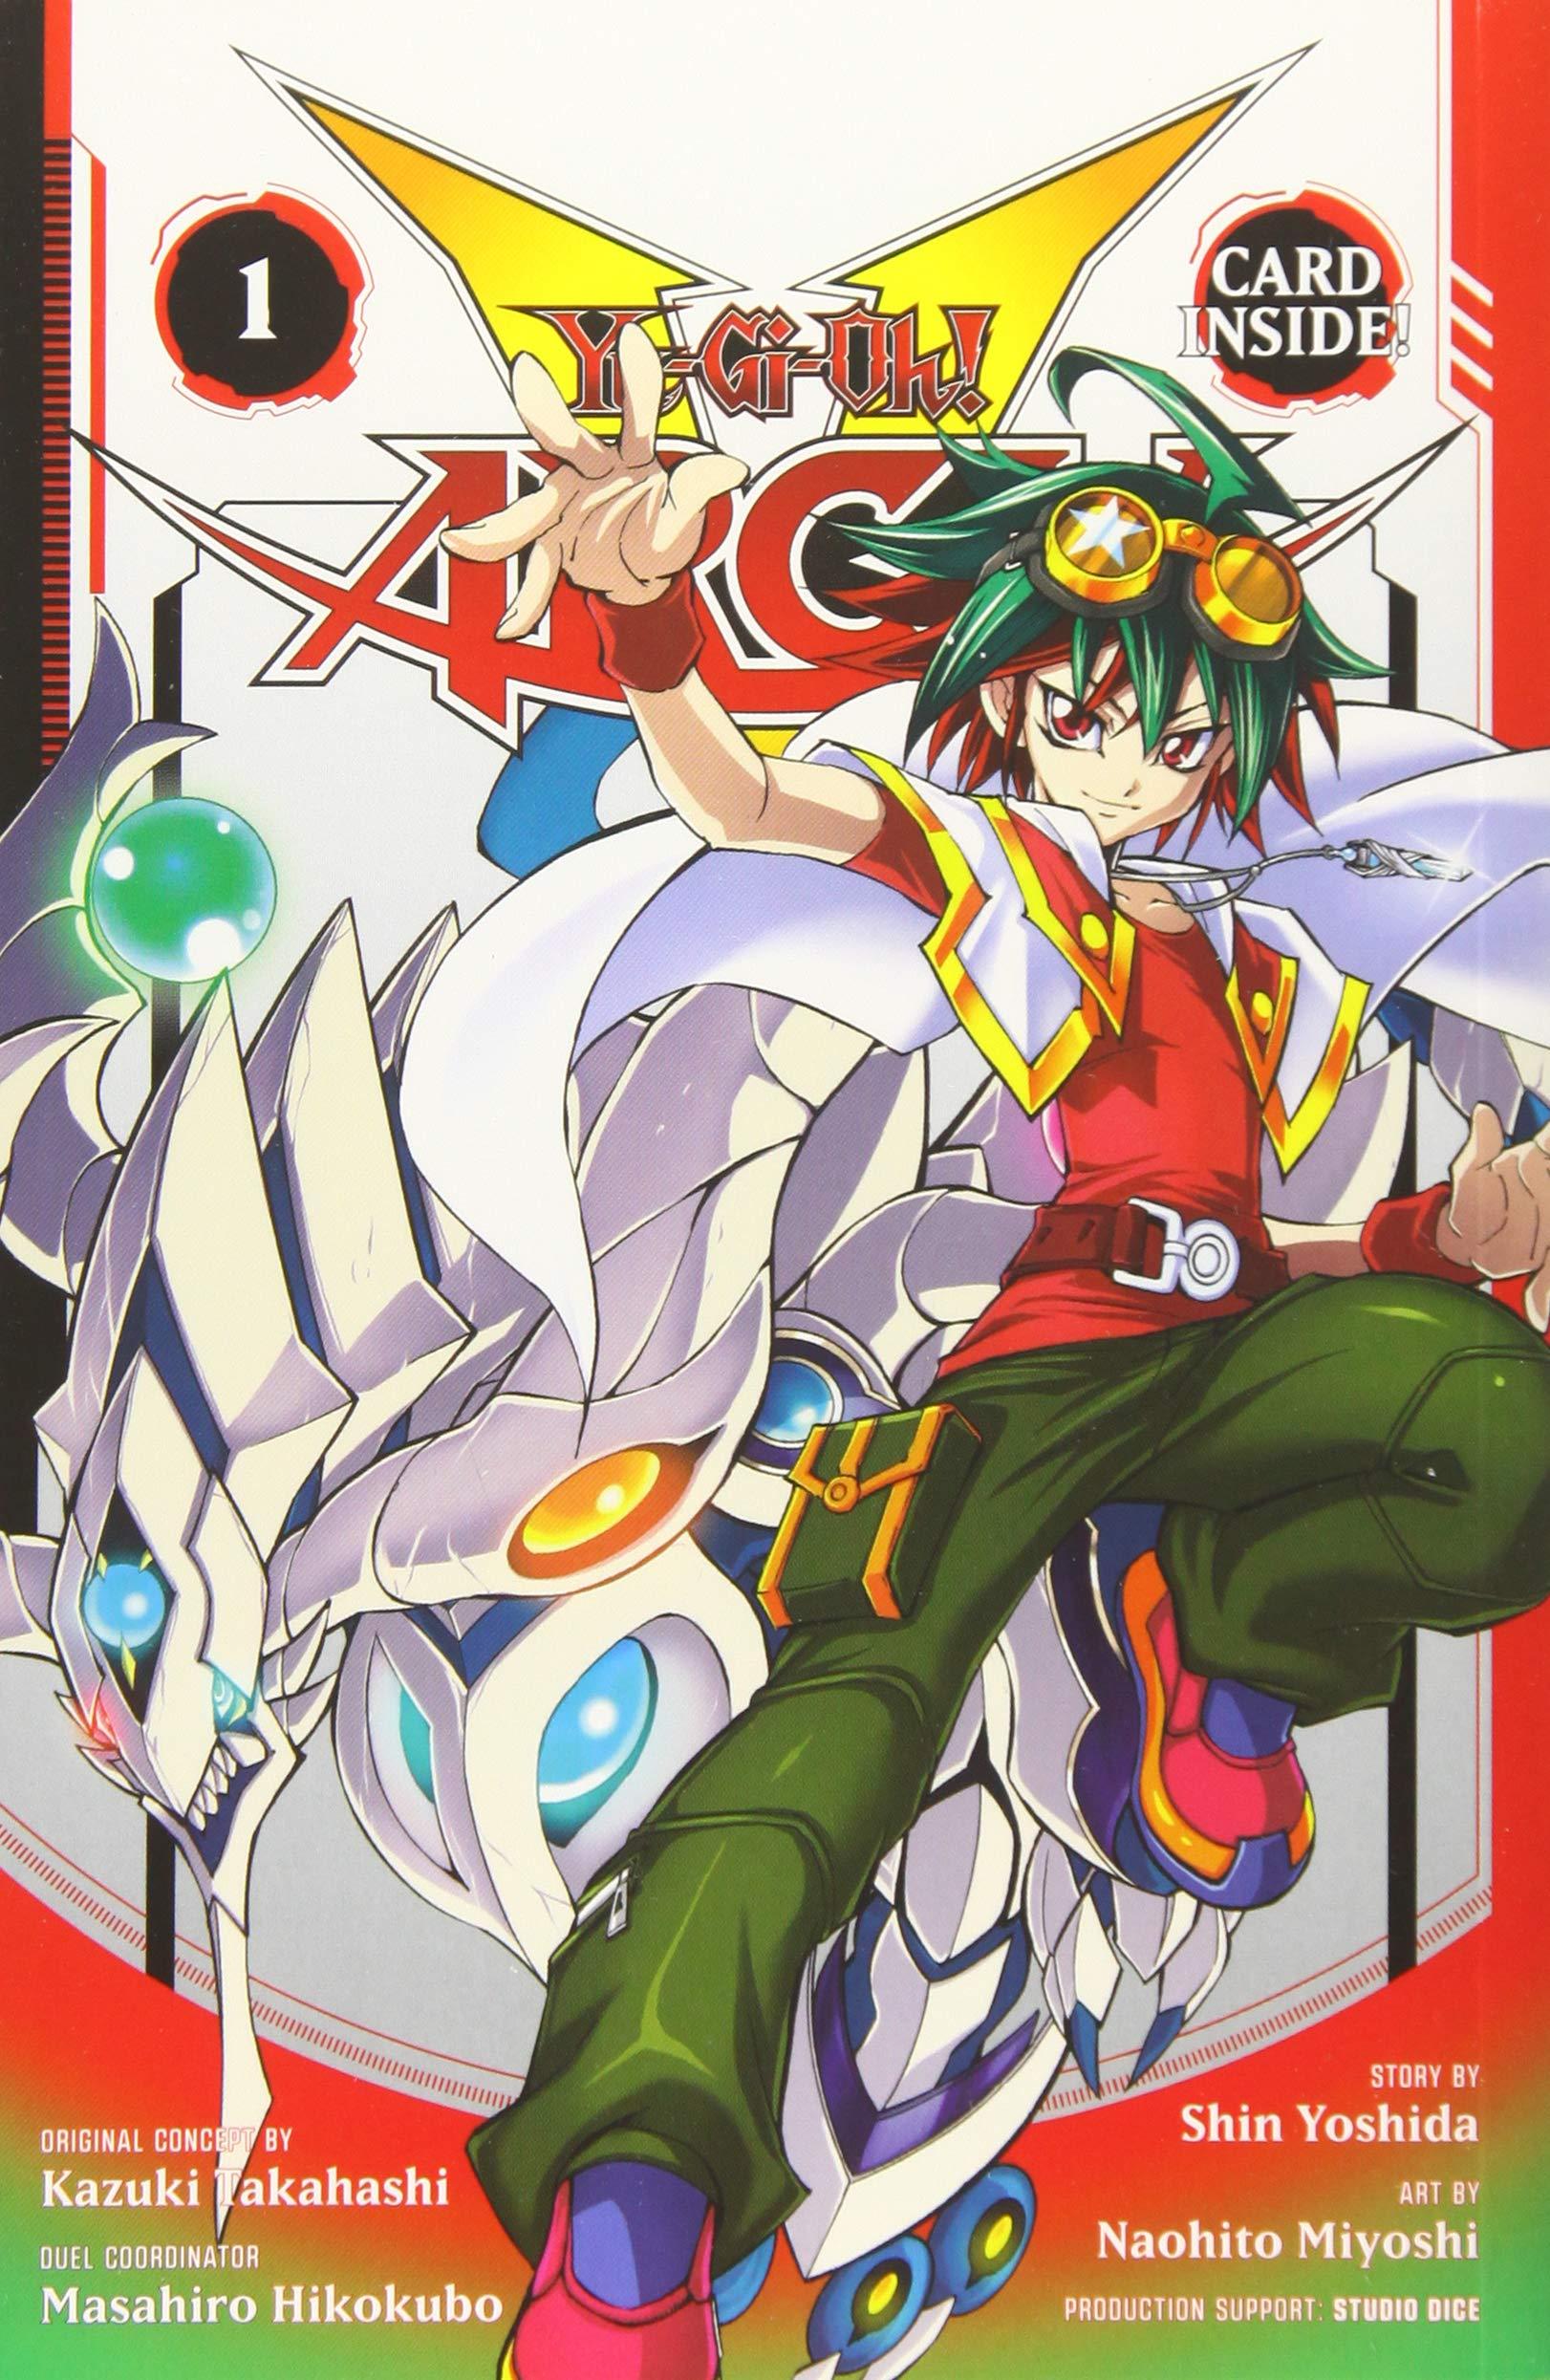 Amazon.com: Yu-Gi-Oh! Arc-V, Vol. 1 (1) (9781421587622 ...